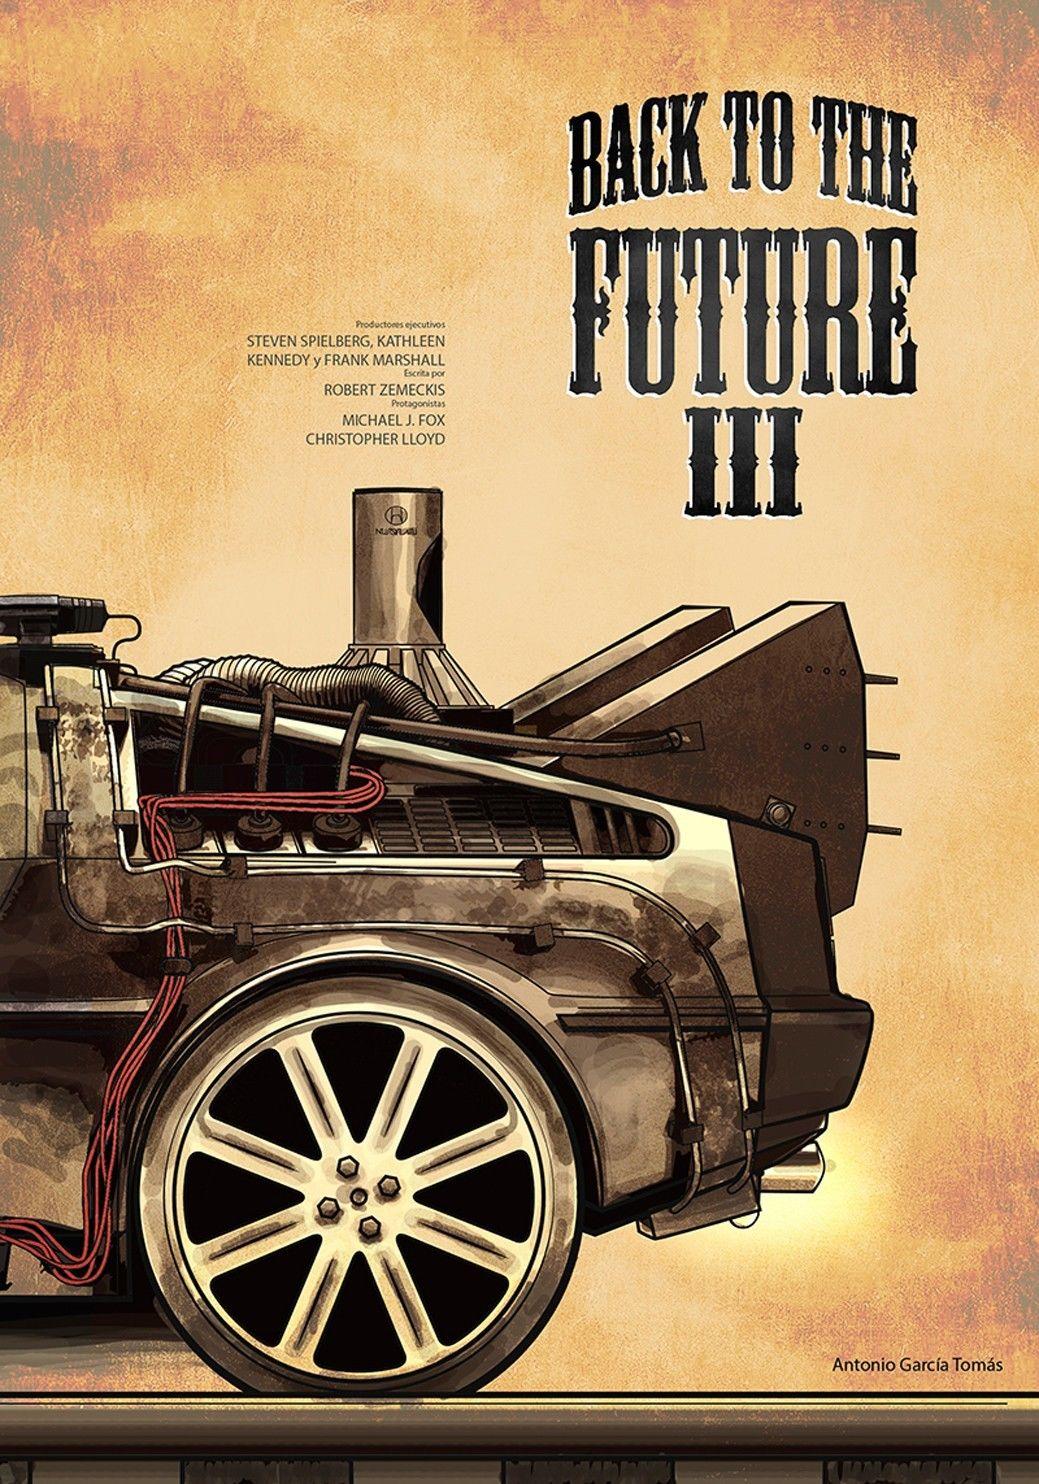 "Back to the Future <font><b>1</b></font> <font><b>2</b></font> 3 Movie Fabric poster 36"" <font><b>x</b></font> <font><b>24</b></font>"" Decor <font><b>22</b></font>"